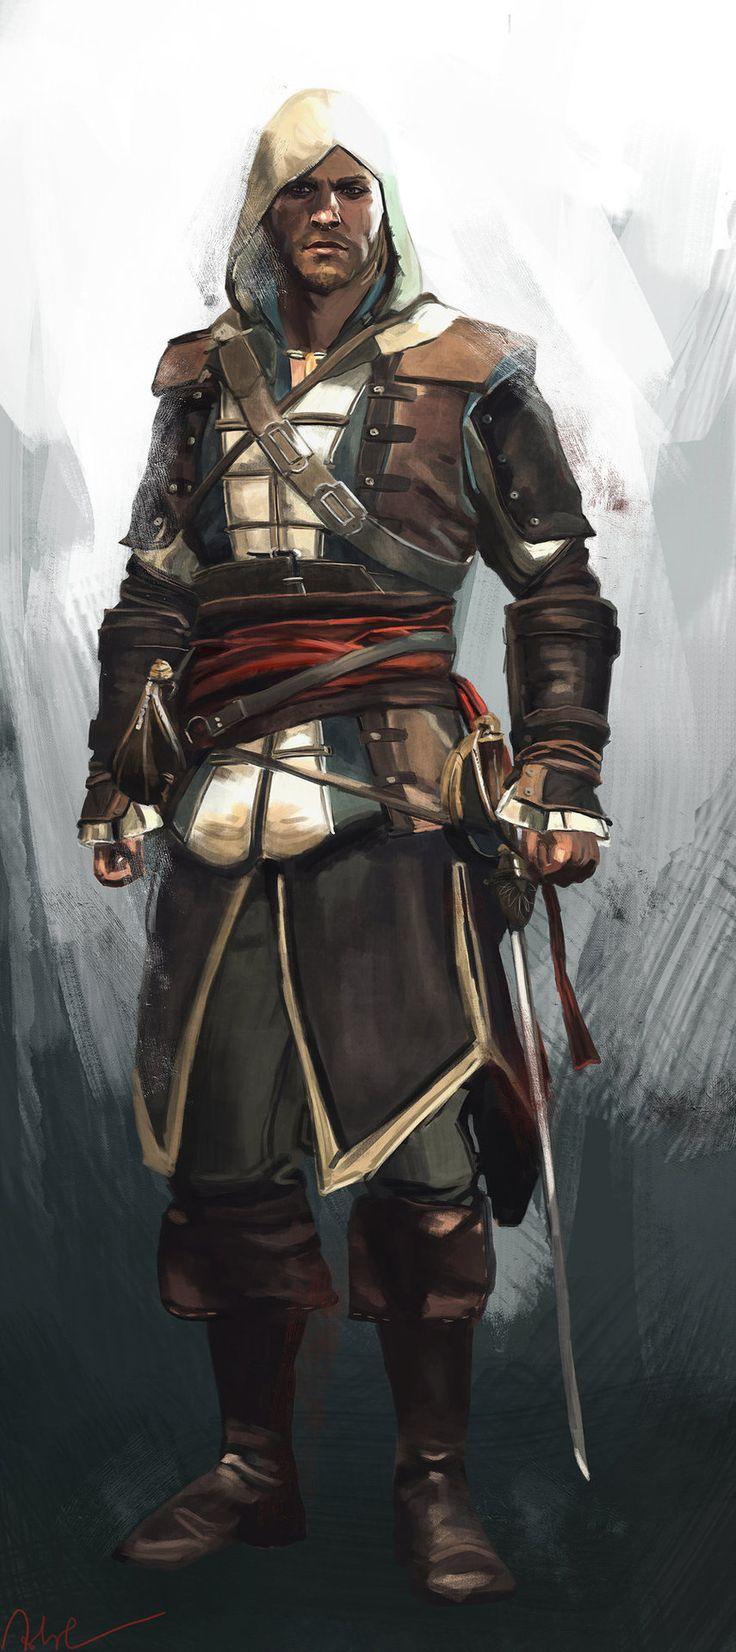 Assassin's Creed IV: Black Flag - Edward Kenway by Namecchan